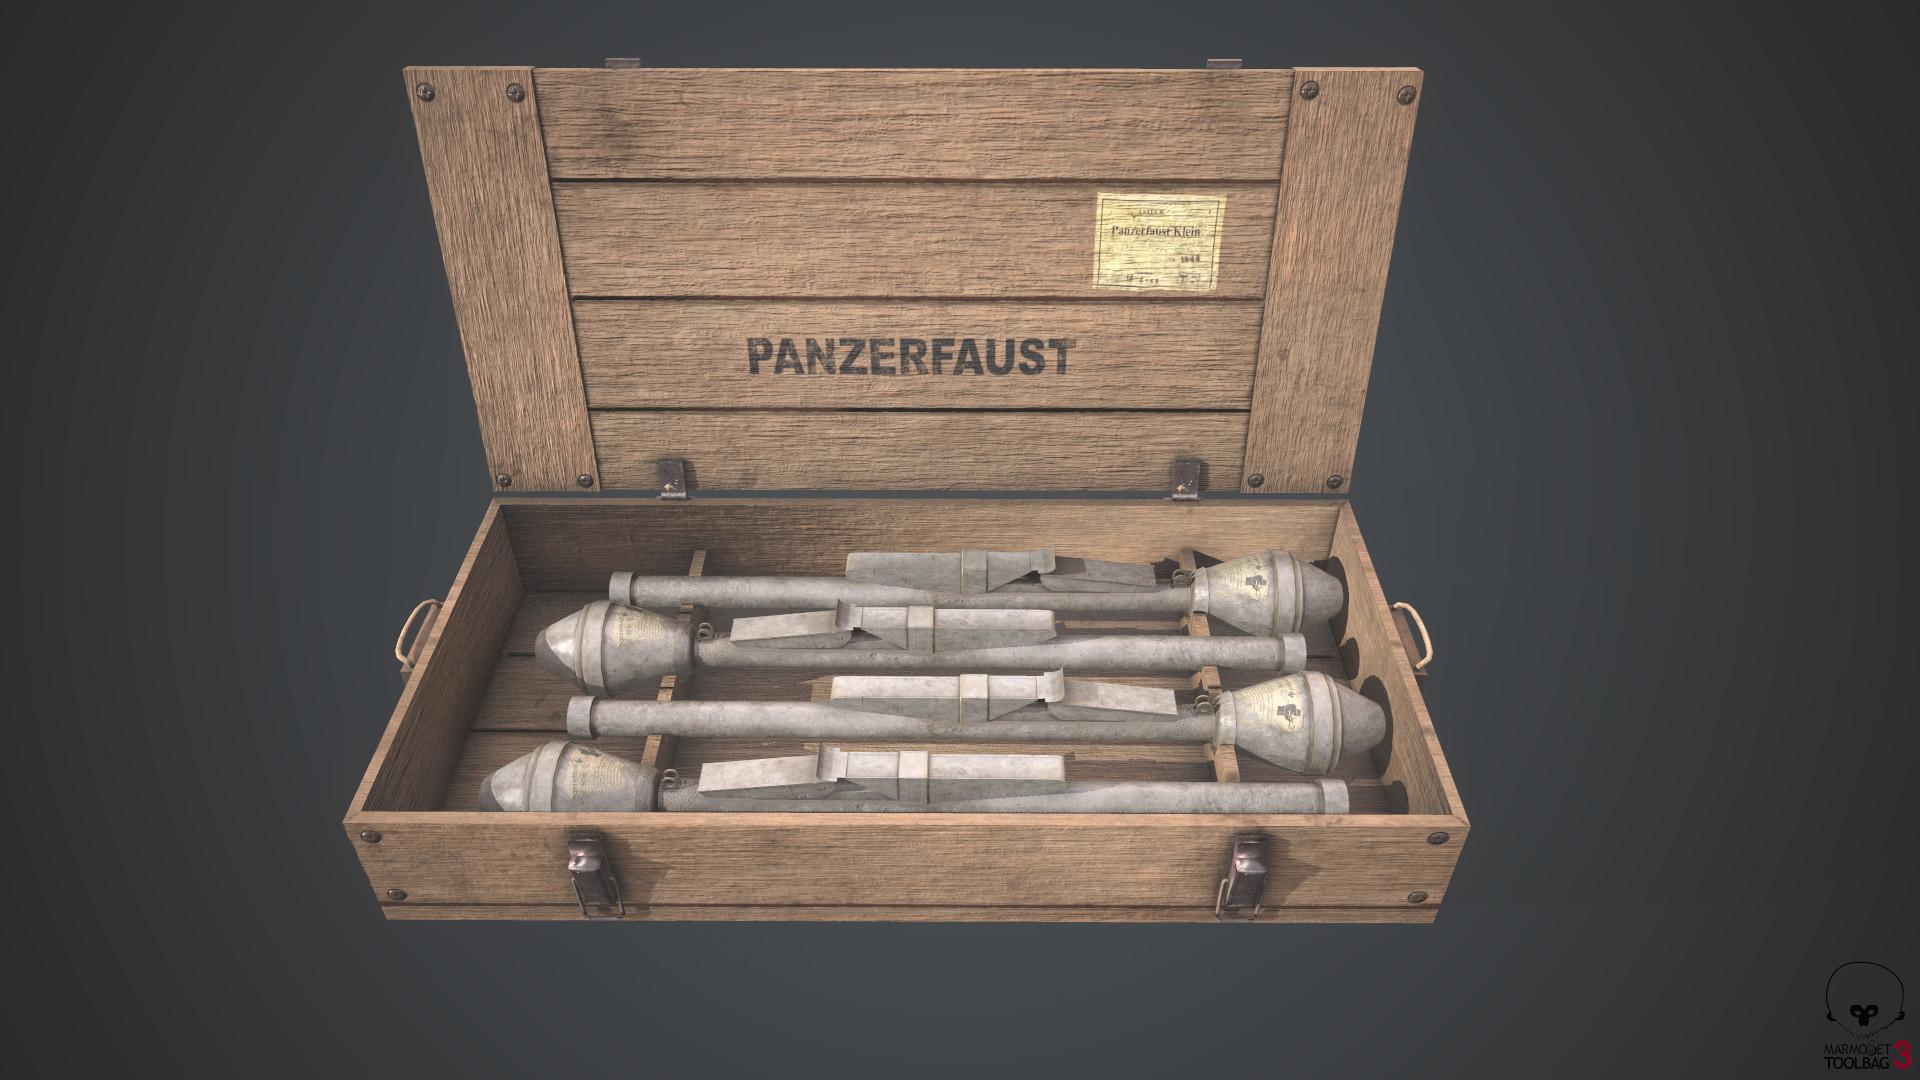 Serdar cendik panzerfaustbox